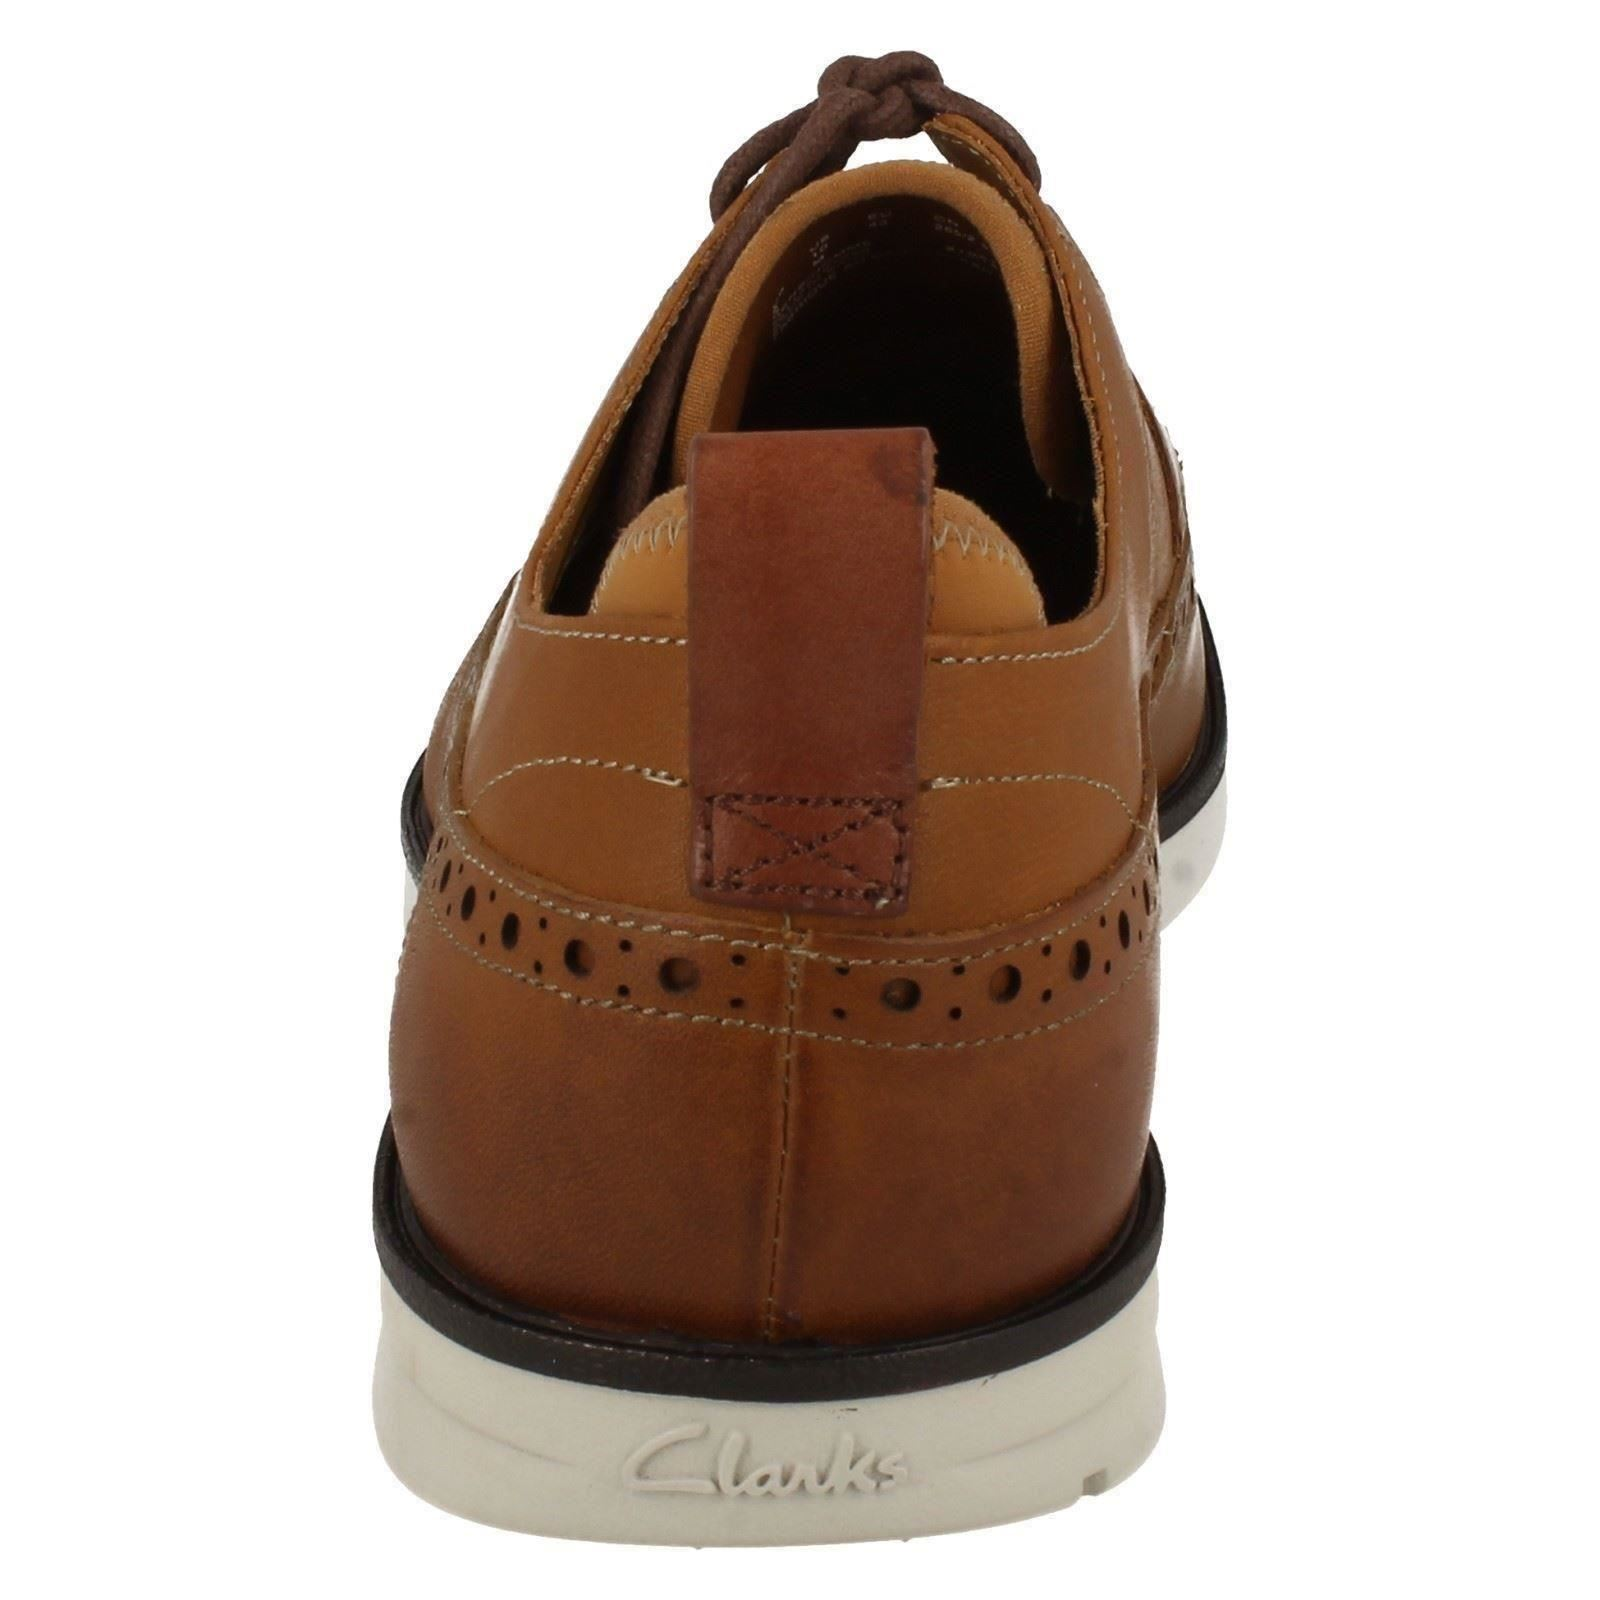 Uomo Clarks Casual Schuhes Limit' 'Trigen Limit' Schuhes 261668